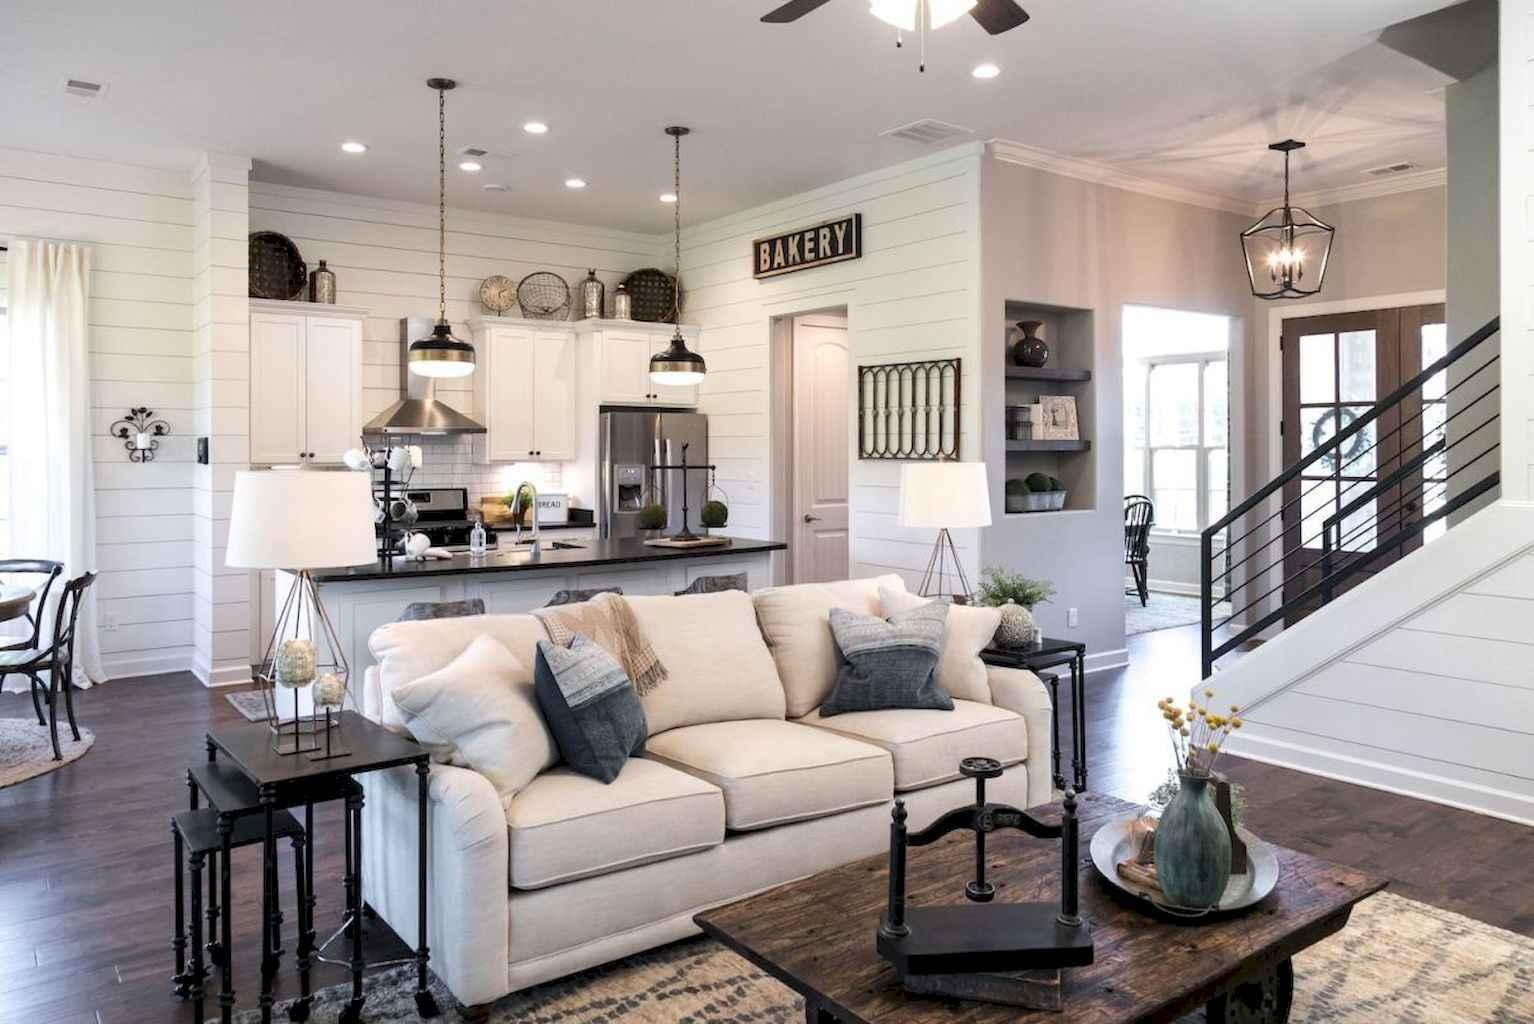 captivating cozy modern living room ideas   54 cozy modern farmhouse living room decor ideas ...